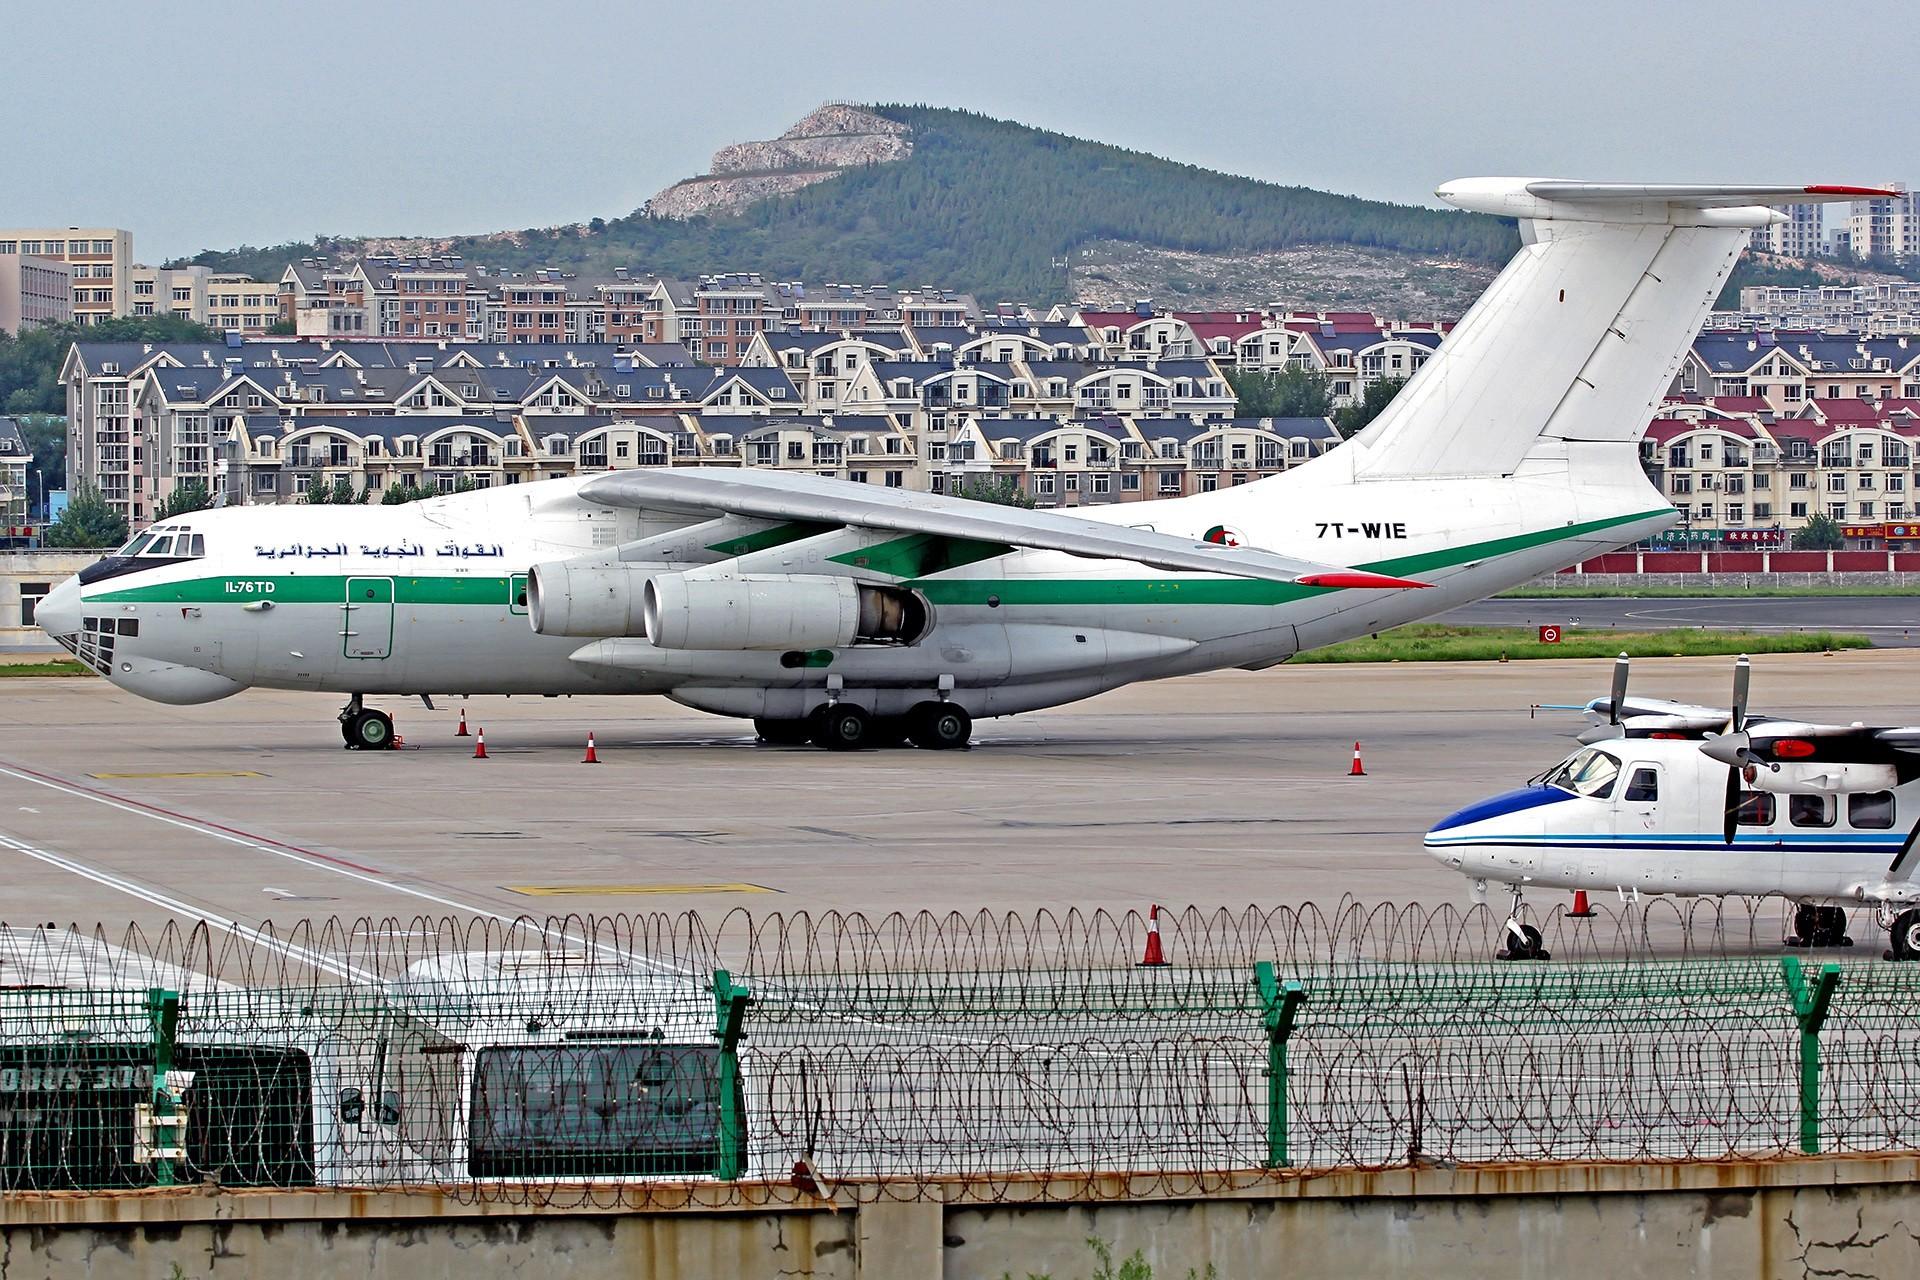 Re:[原创][DLC]... 阿尔及利亚空军 IL-76TD…璀璨星昼夜 ILYUSHIN IL-76-TD 7T-WIET 中国大连周水子国际机场